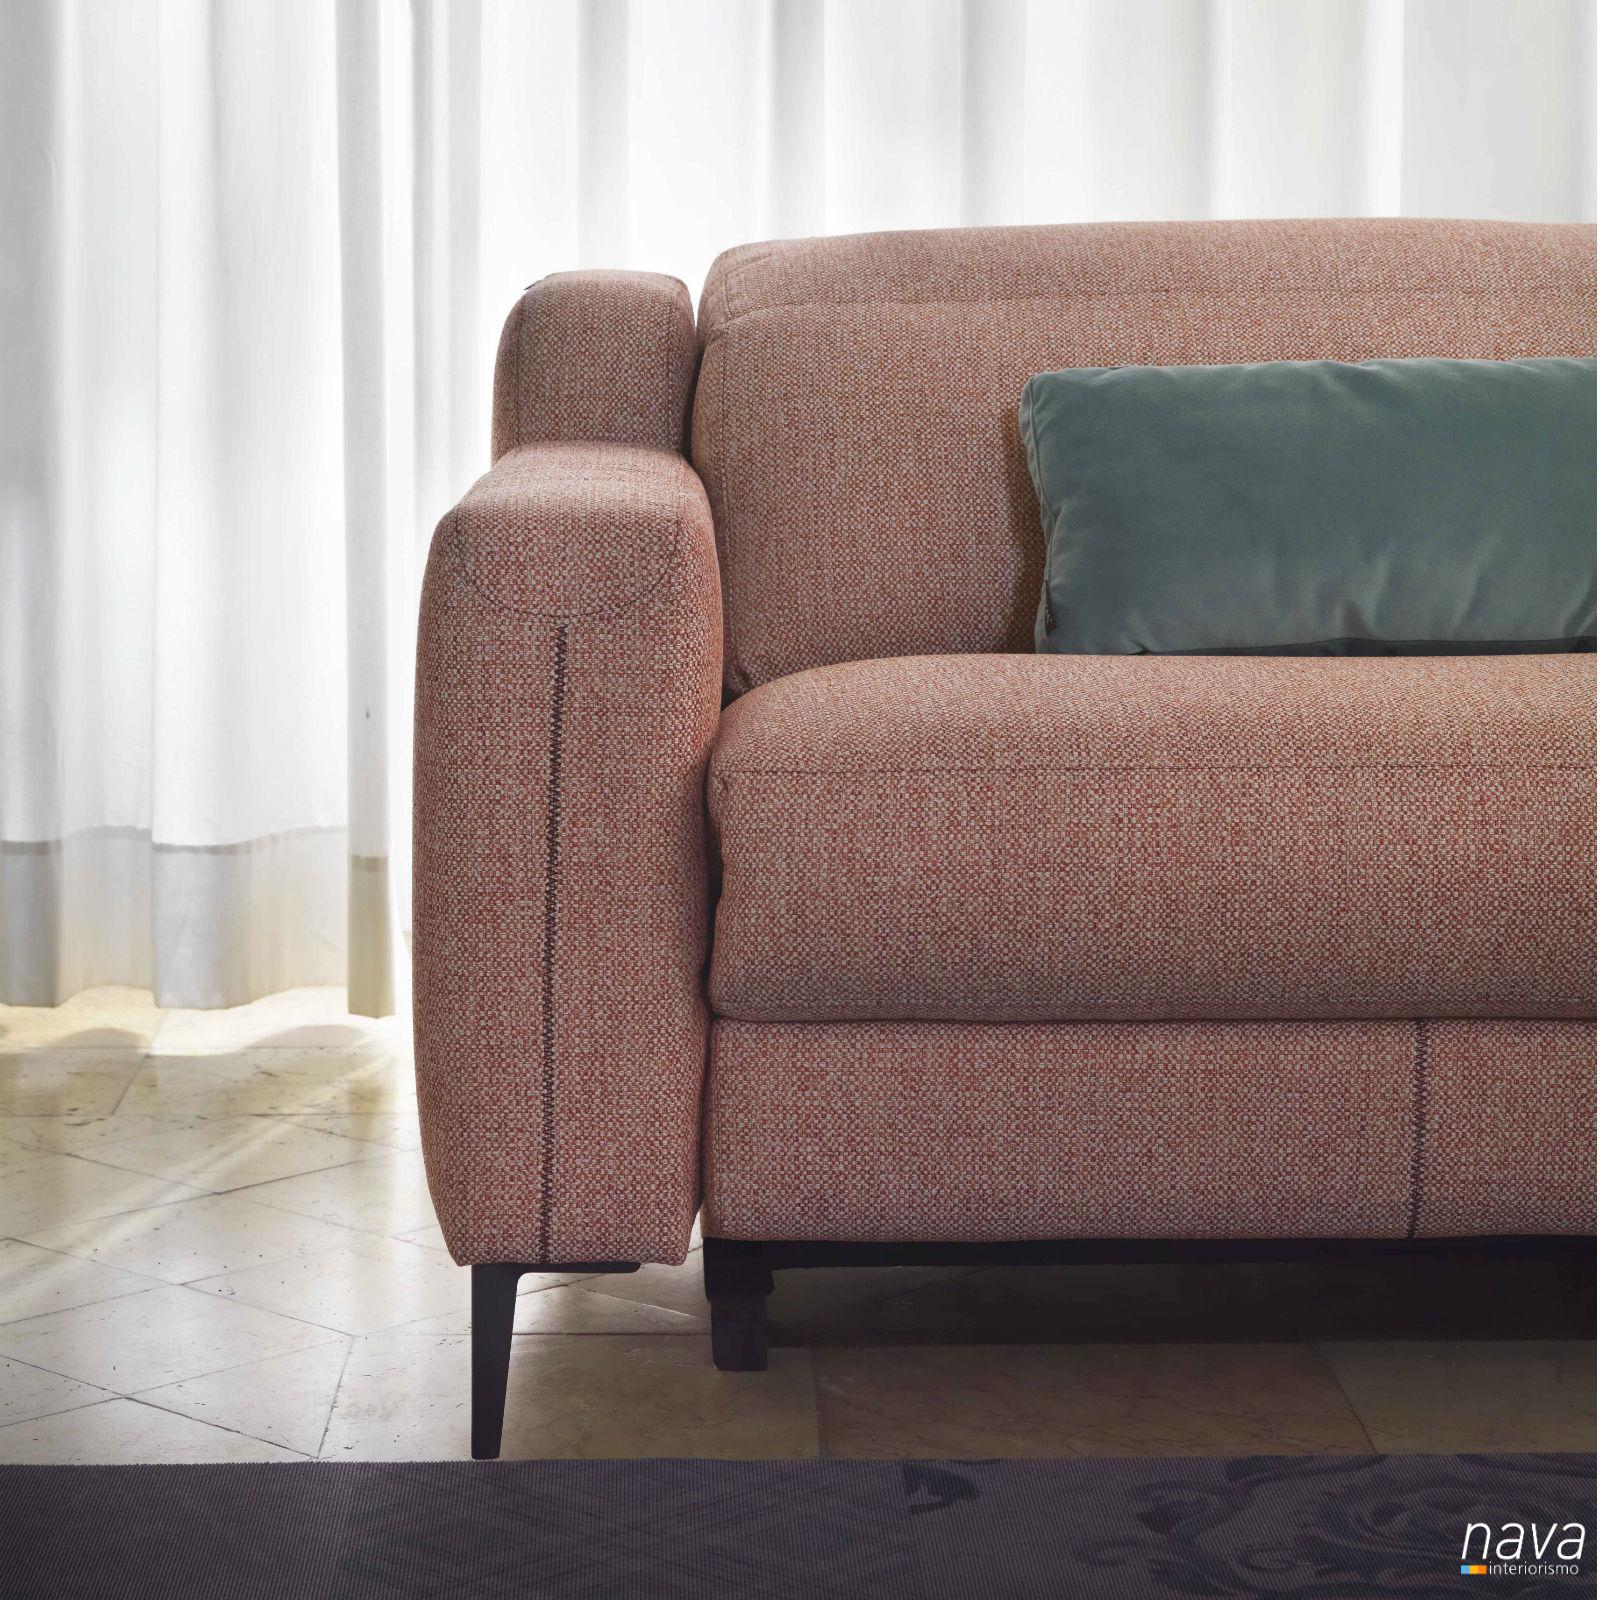 detalle-sofa-costura-contrastada